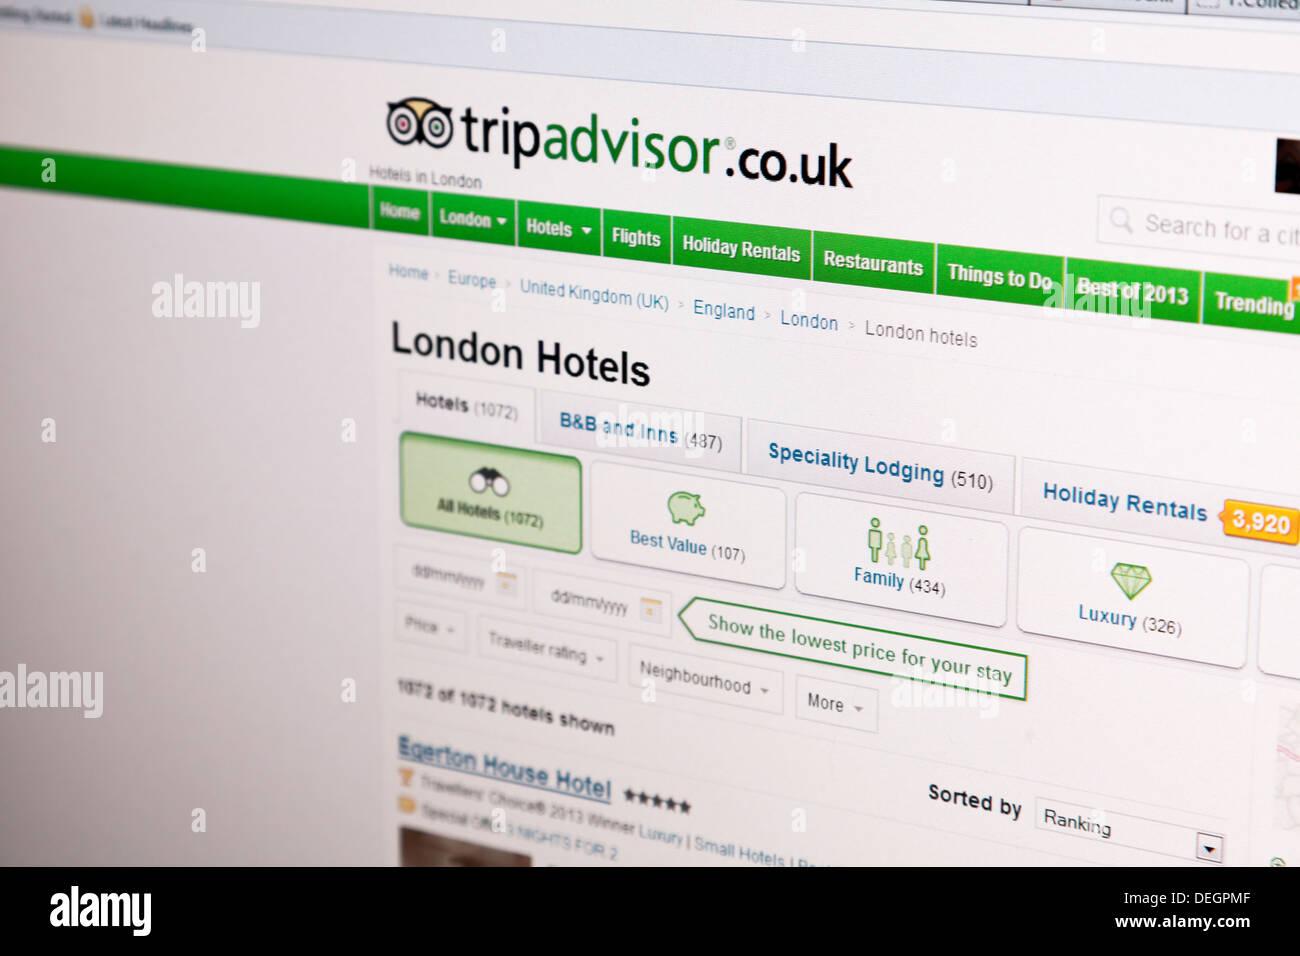 Tripadvisor tripadvisor internet versión UK Tripadvisor.co.uk Imagen De Stock